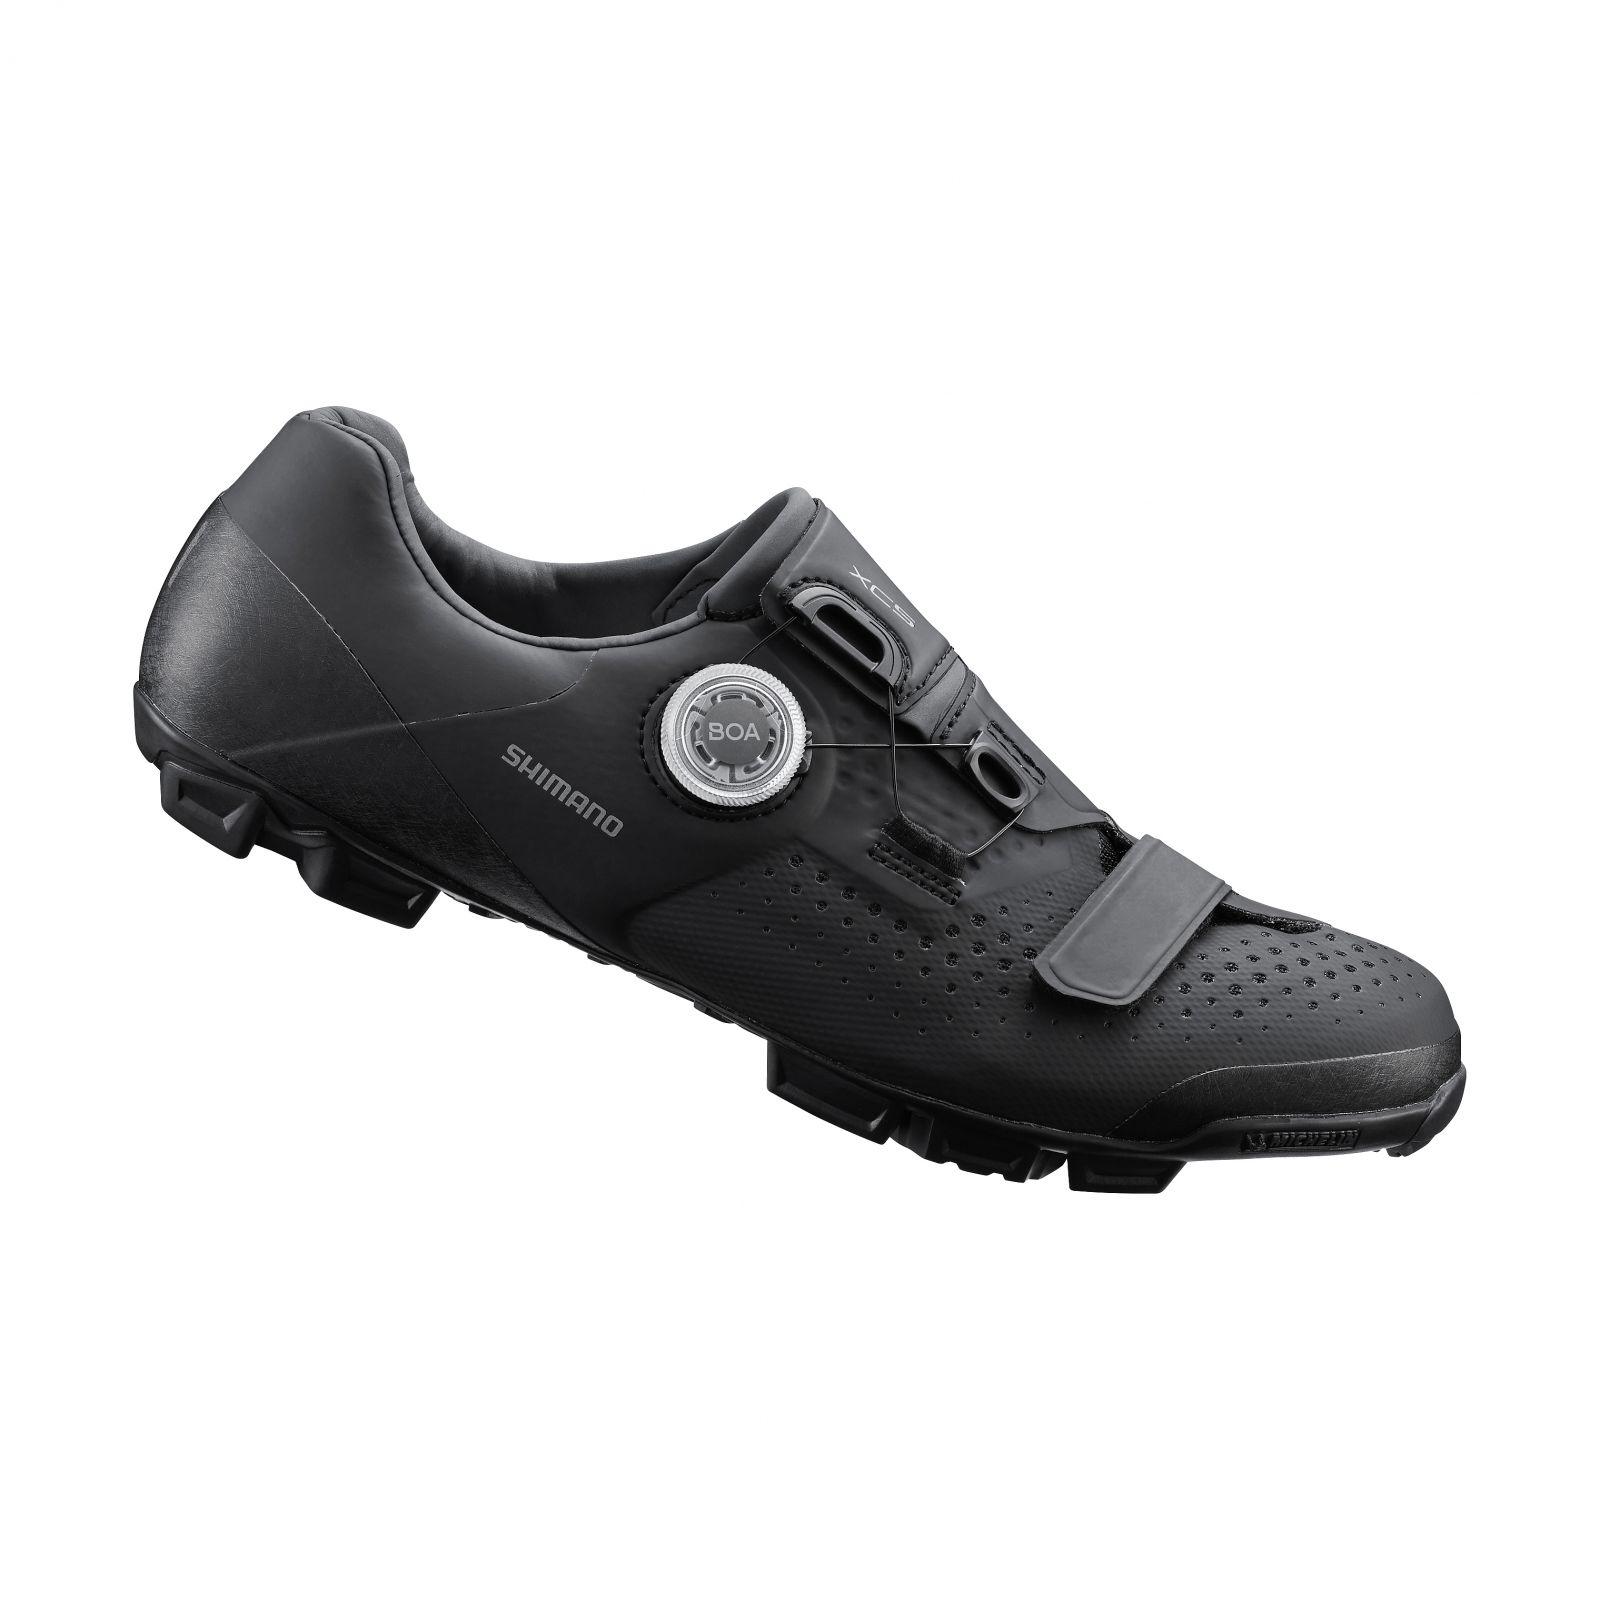 SHIMANO MTB obuv SH-XC501ML, černá, 45